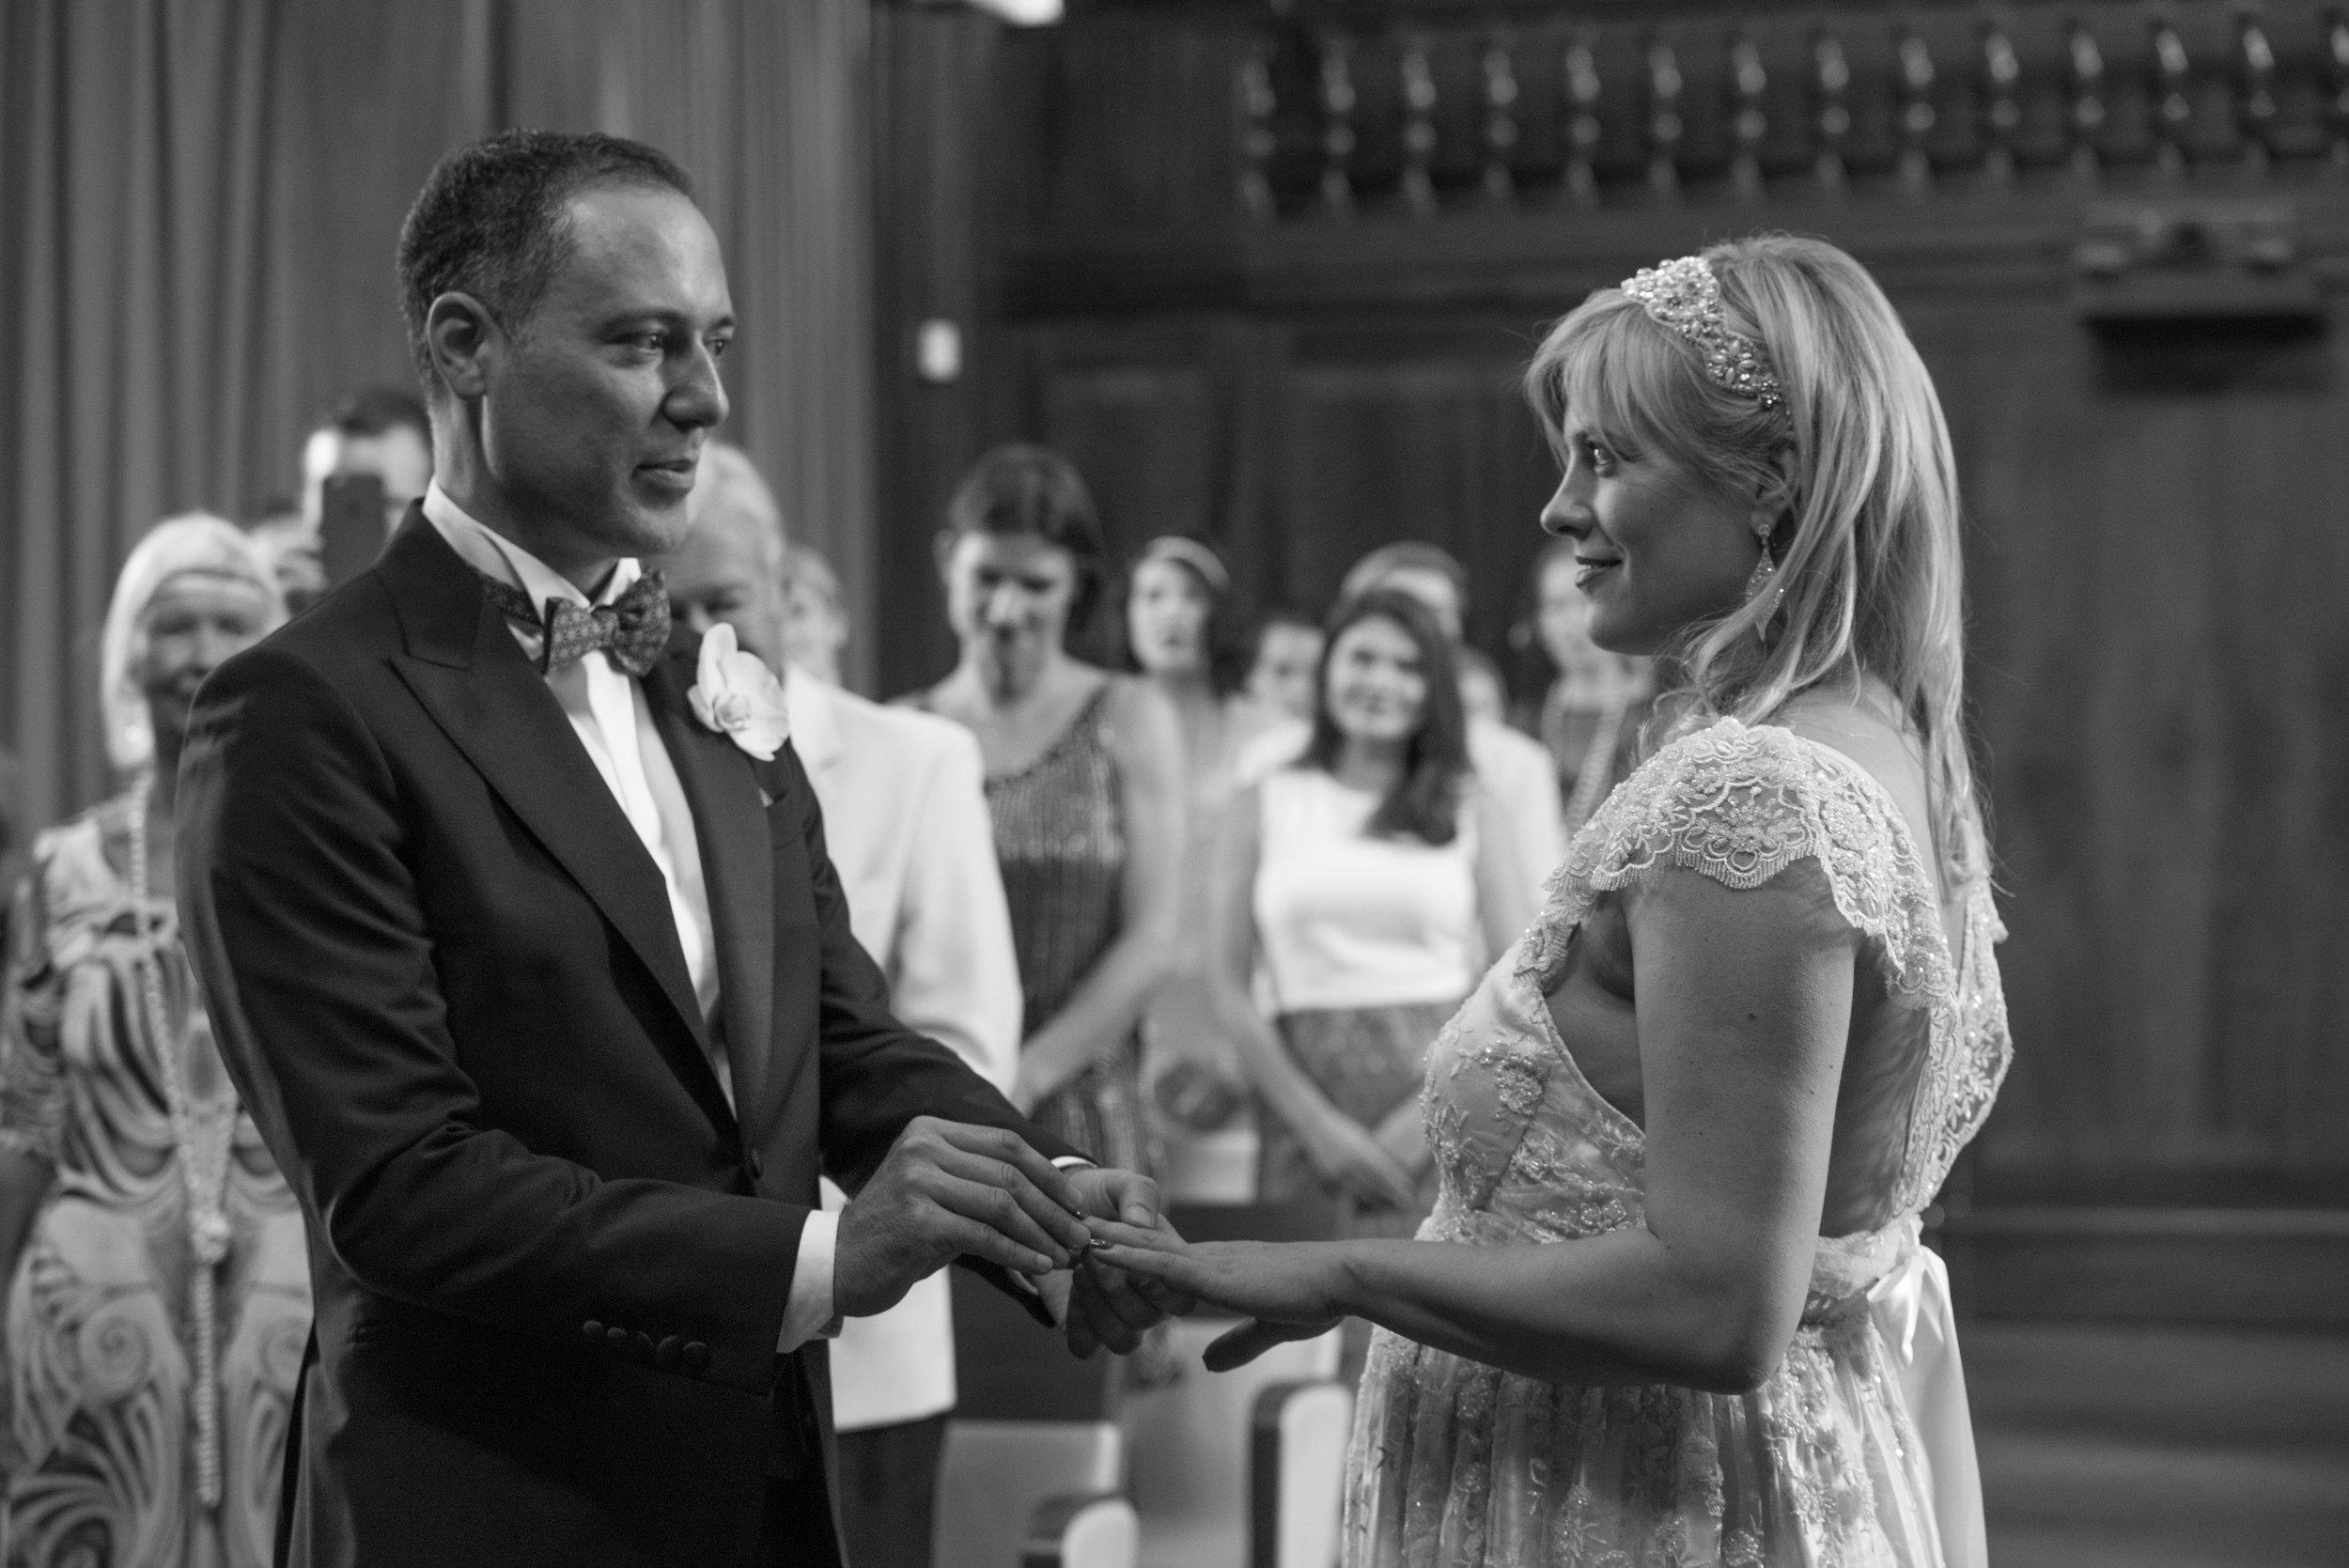 Wedding story. Stoke Newington Town Hall wedding